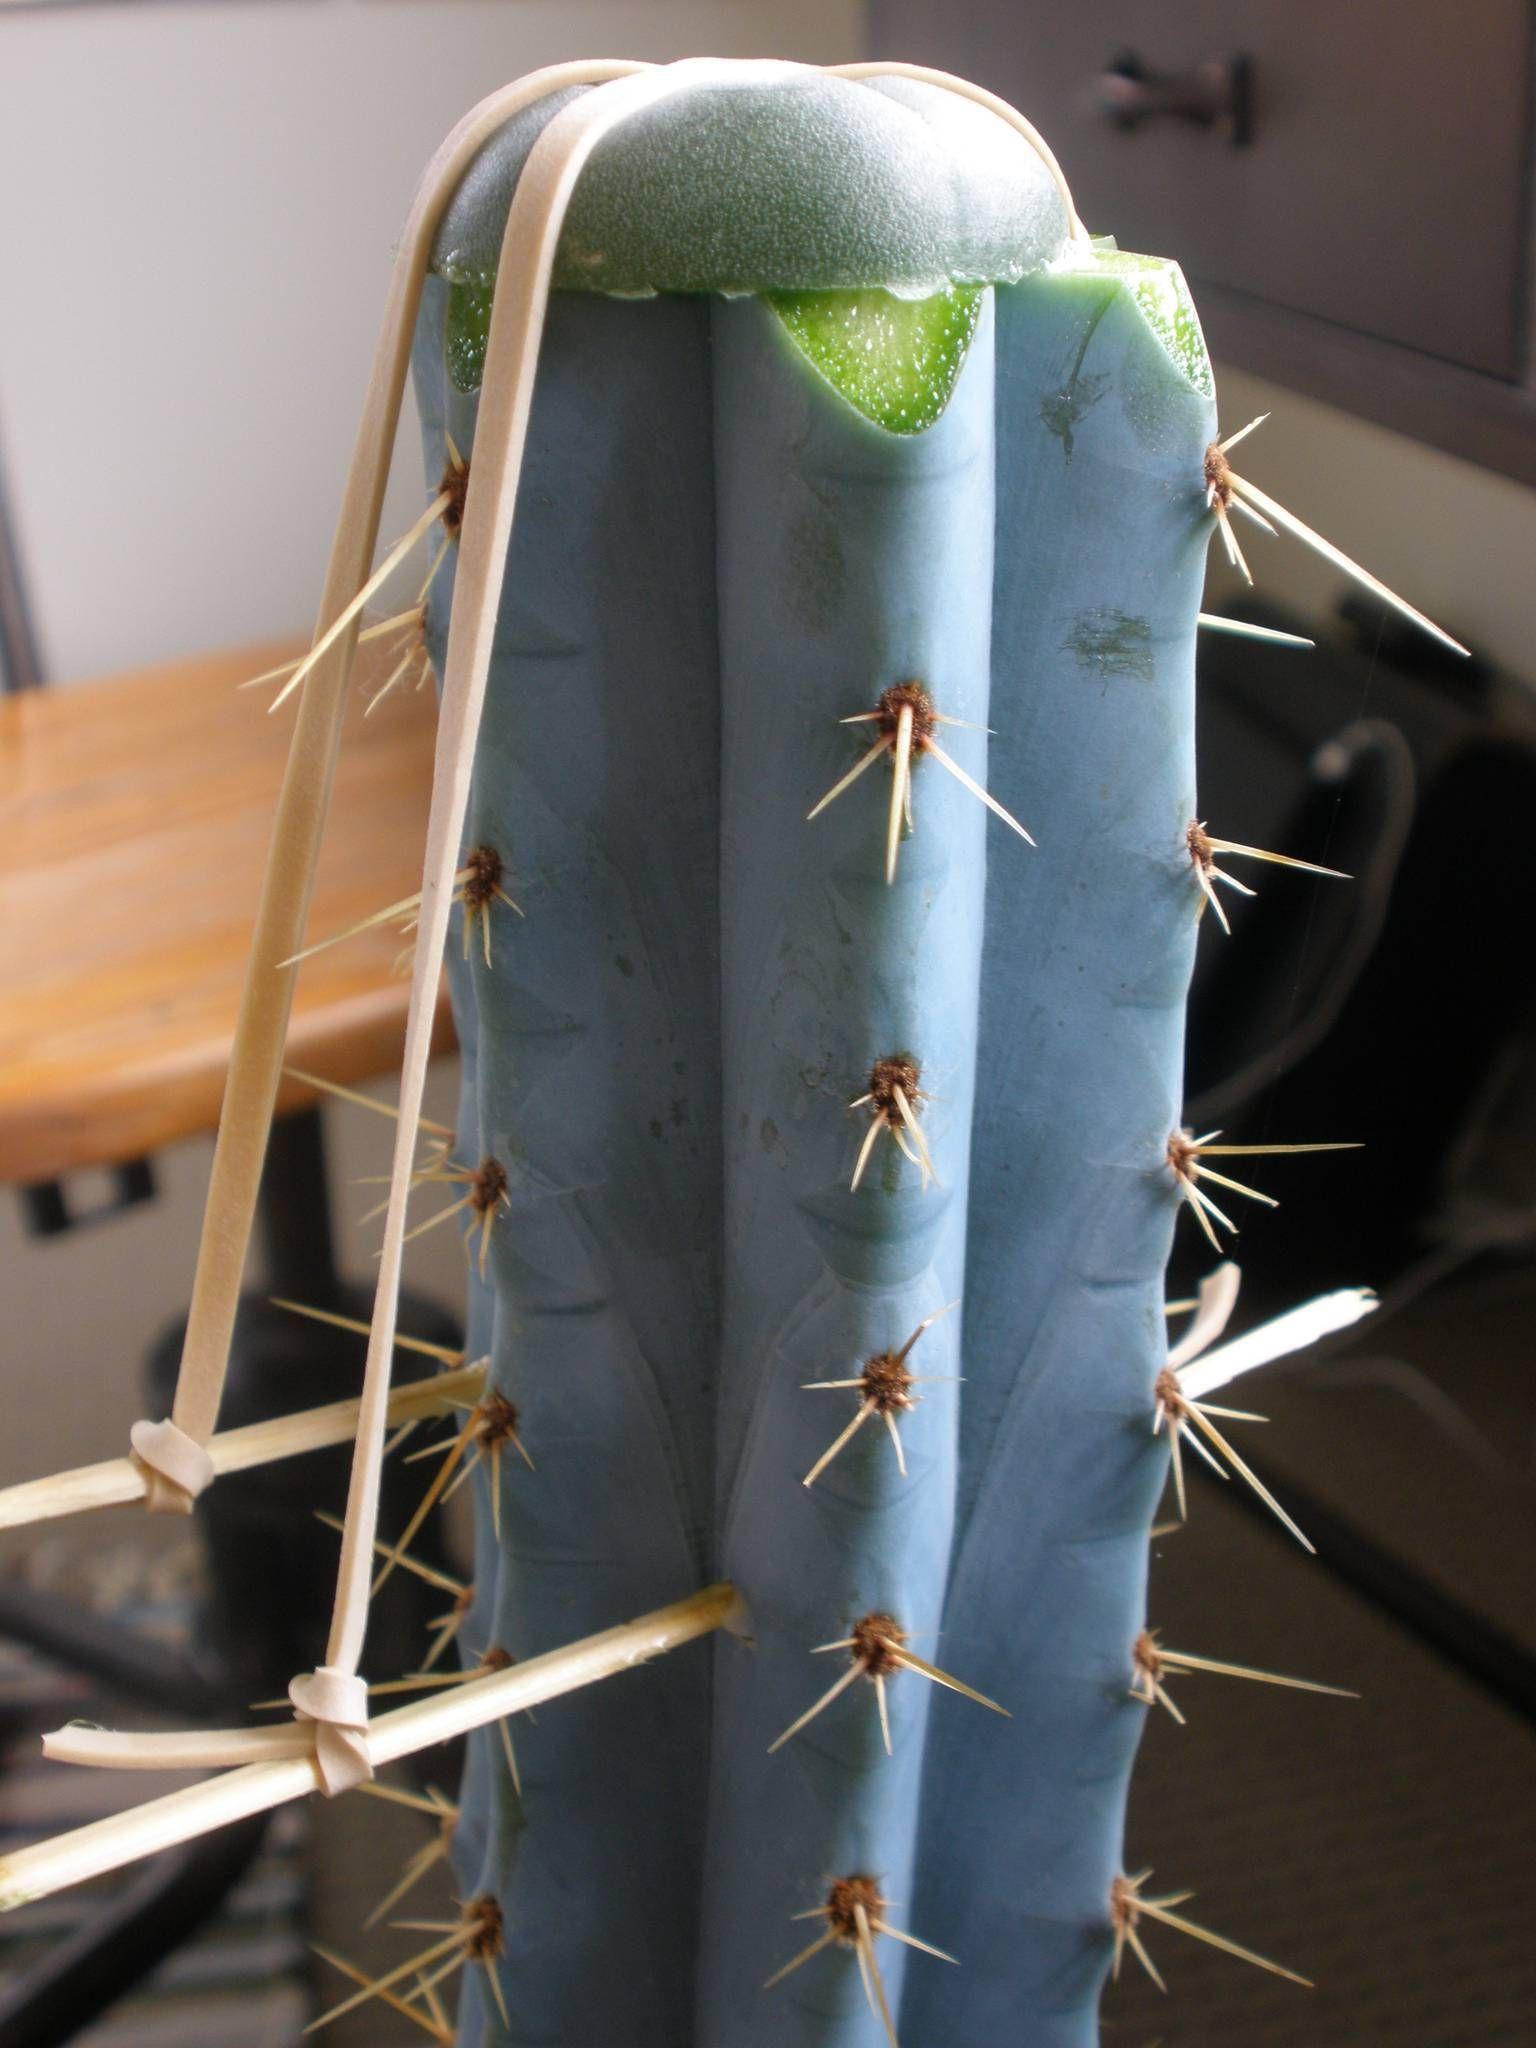 Cactus Id Please The Ethnobotanical Garden Grafted Cactus Cactus Cactus Plants